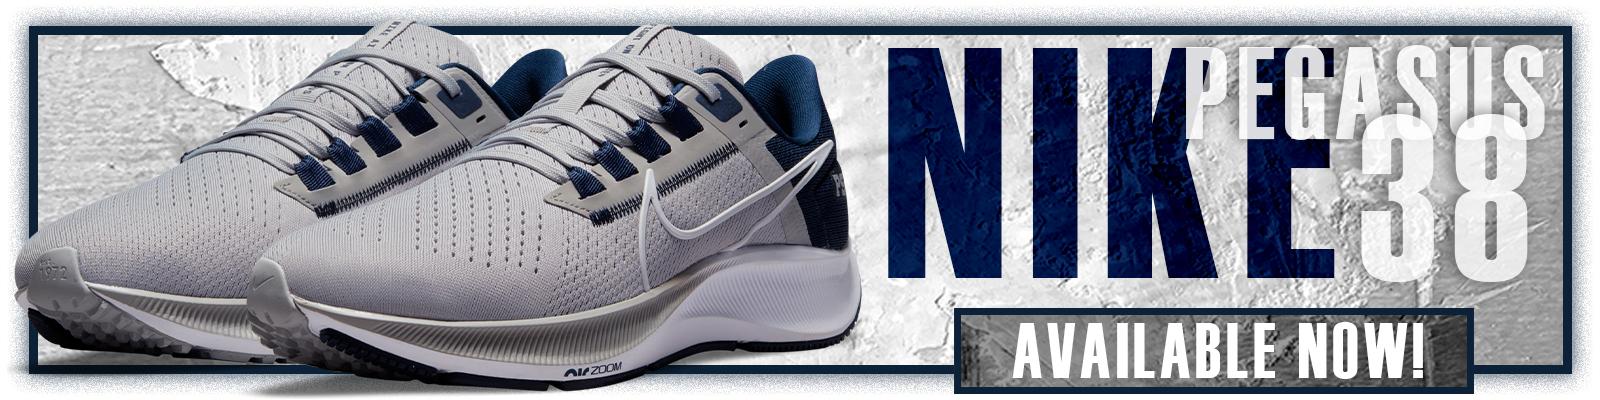 Click to Shop the PSU Nike Pegasus 38 Shoe!